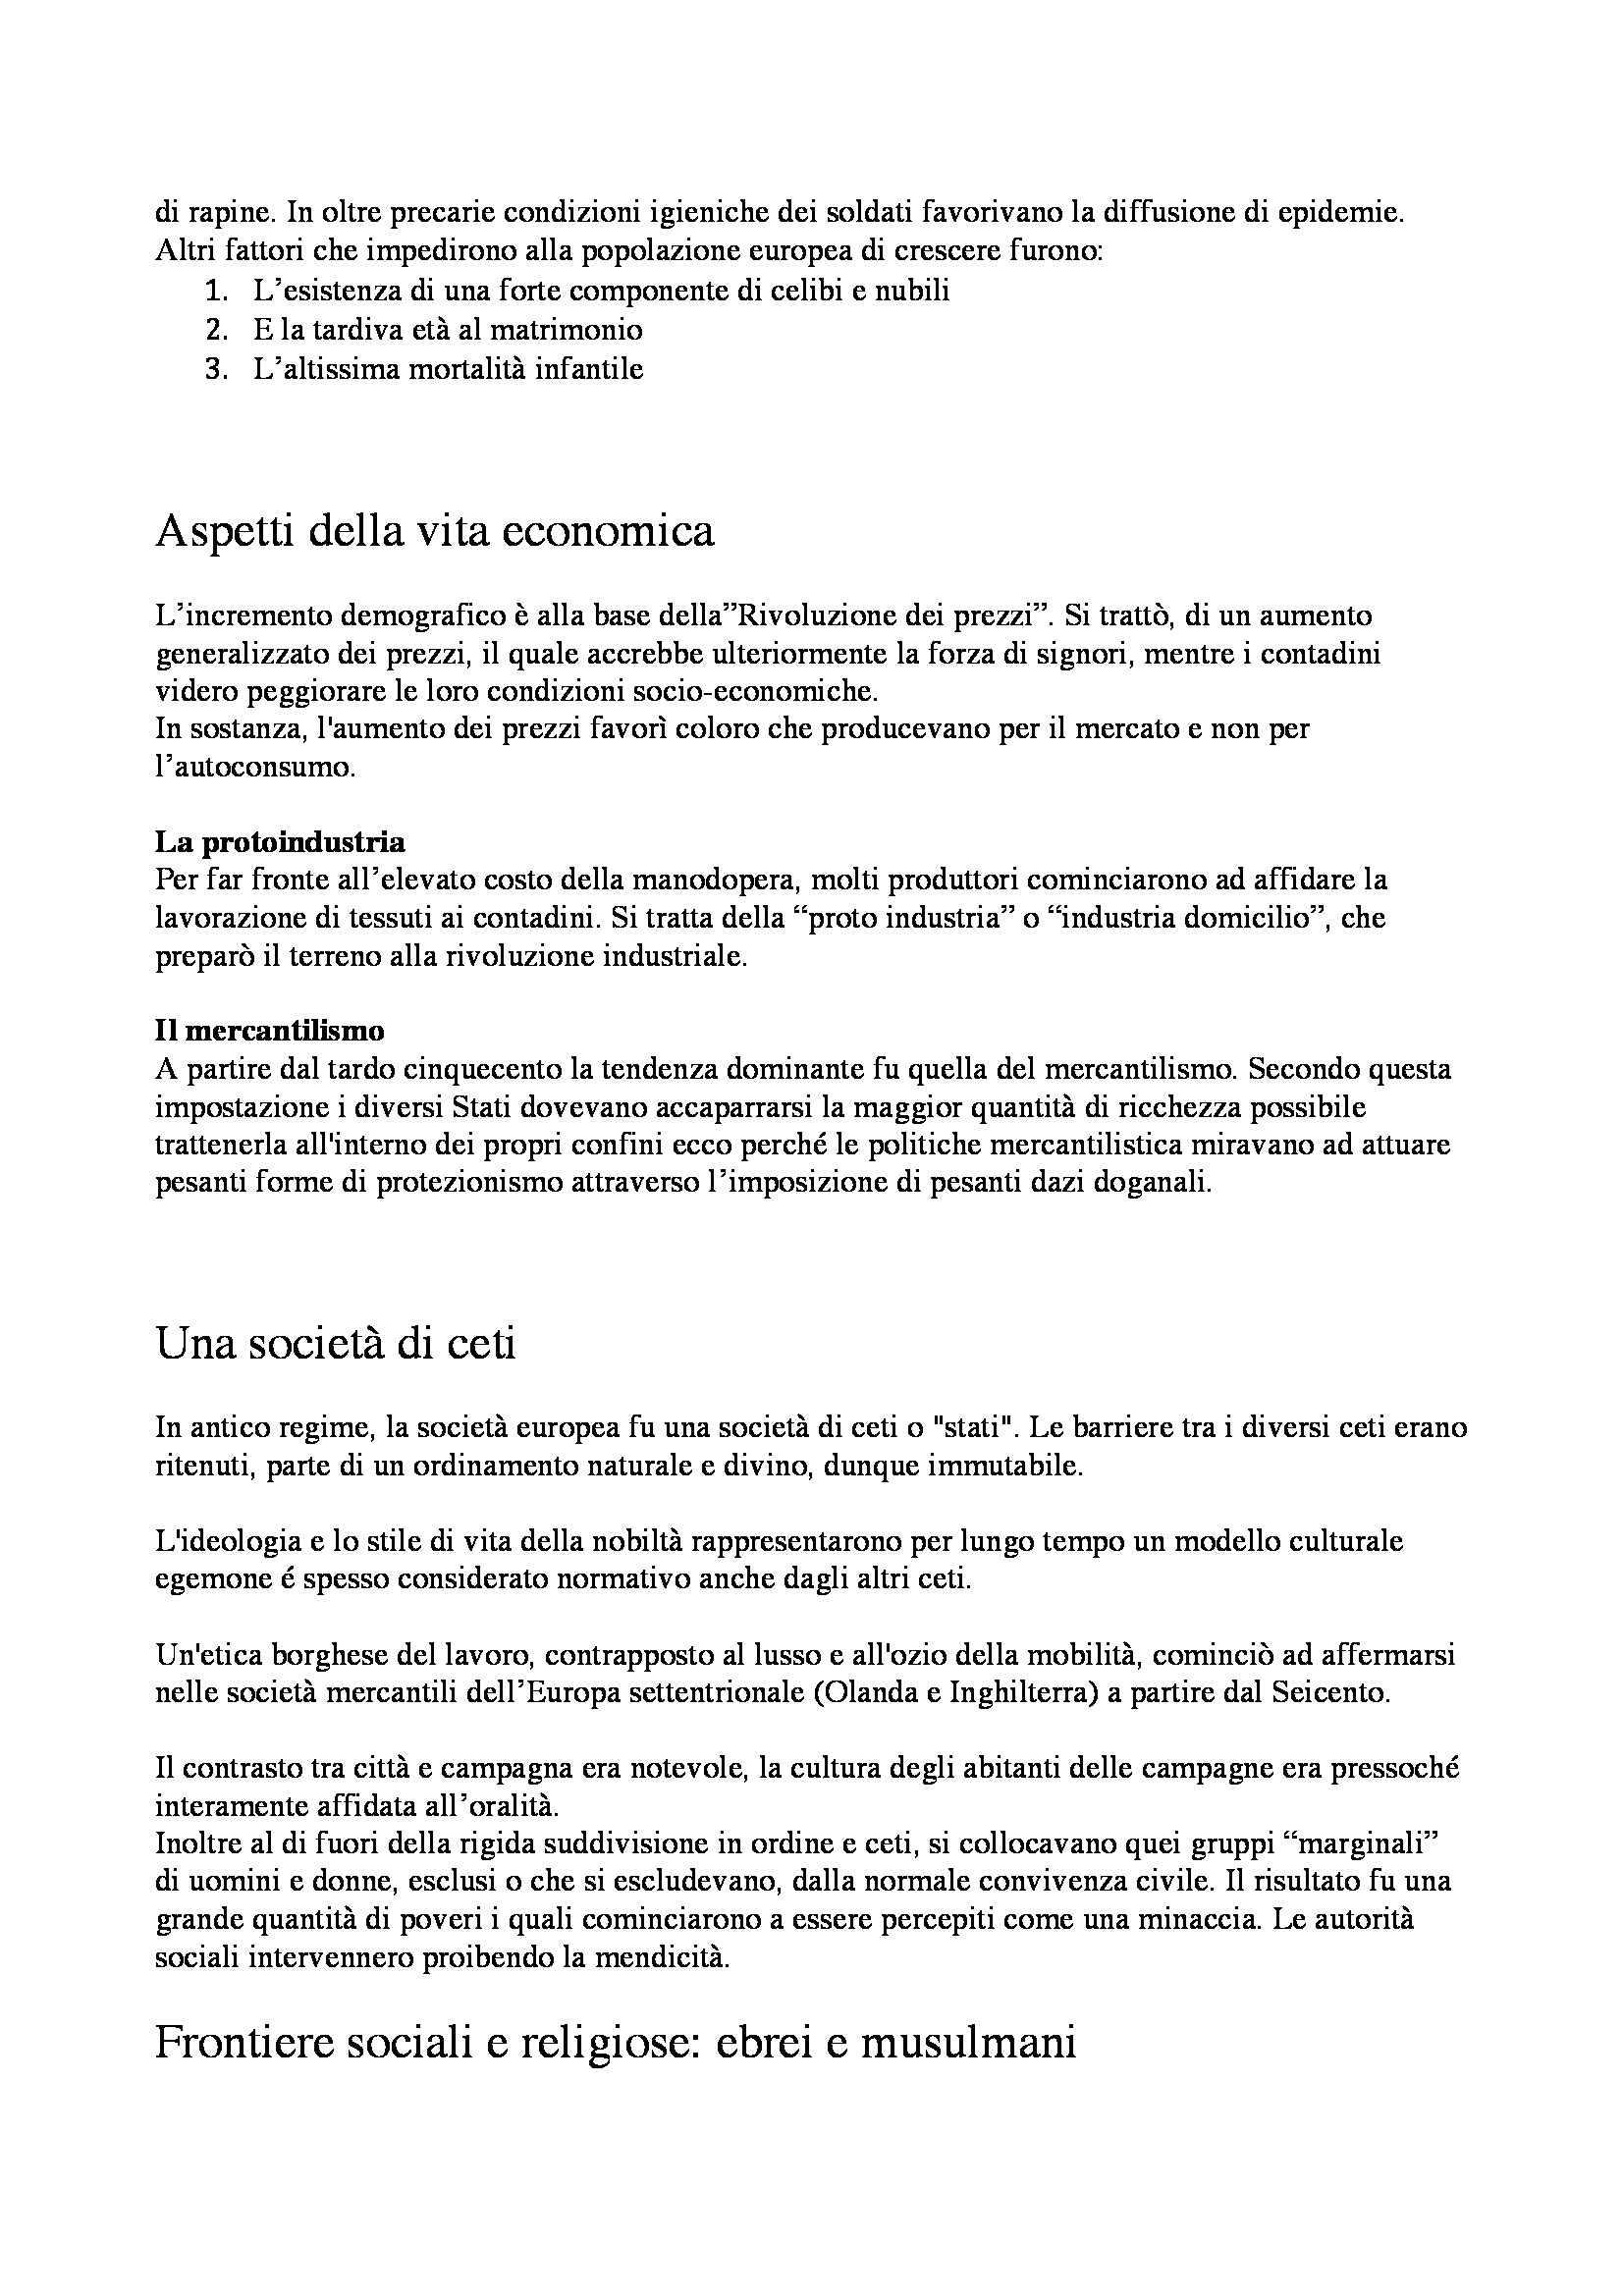 Riassunto esame Storia moderna, I temi e le fonti, prof. Dall'Olio Pag. 2